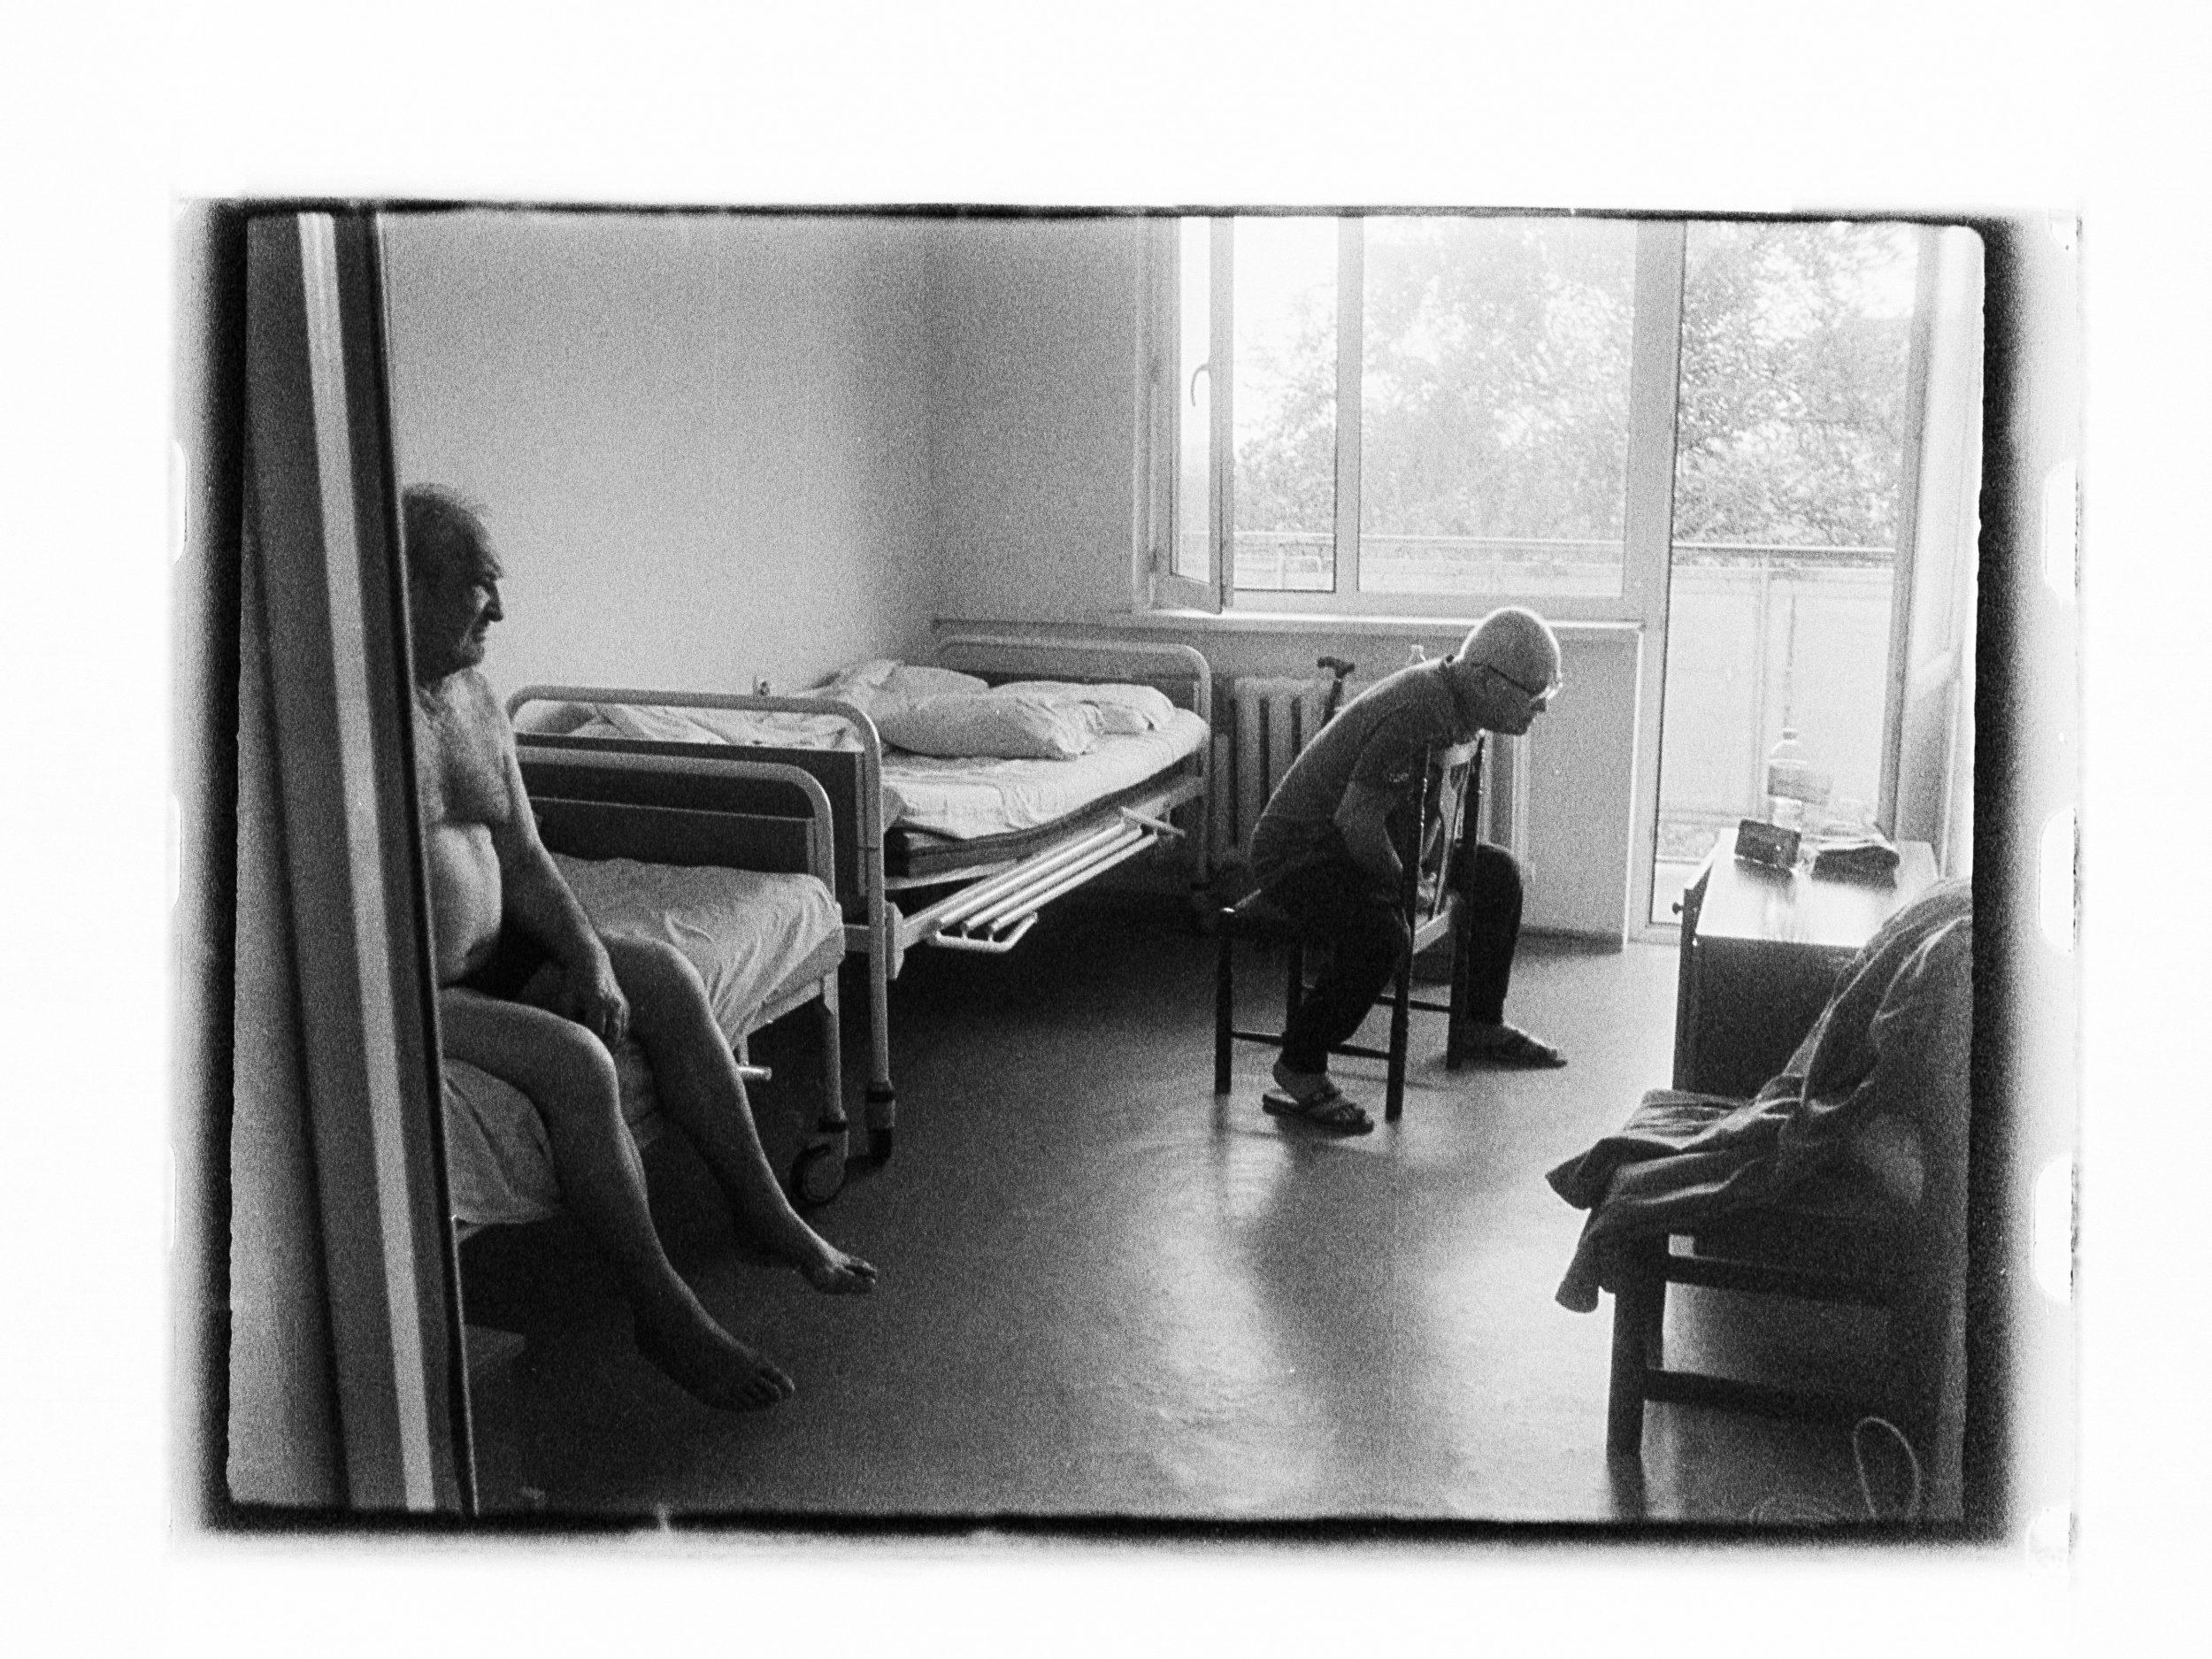 Men watching smartphone (Pic: Andrey Khludeyev)